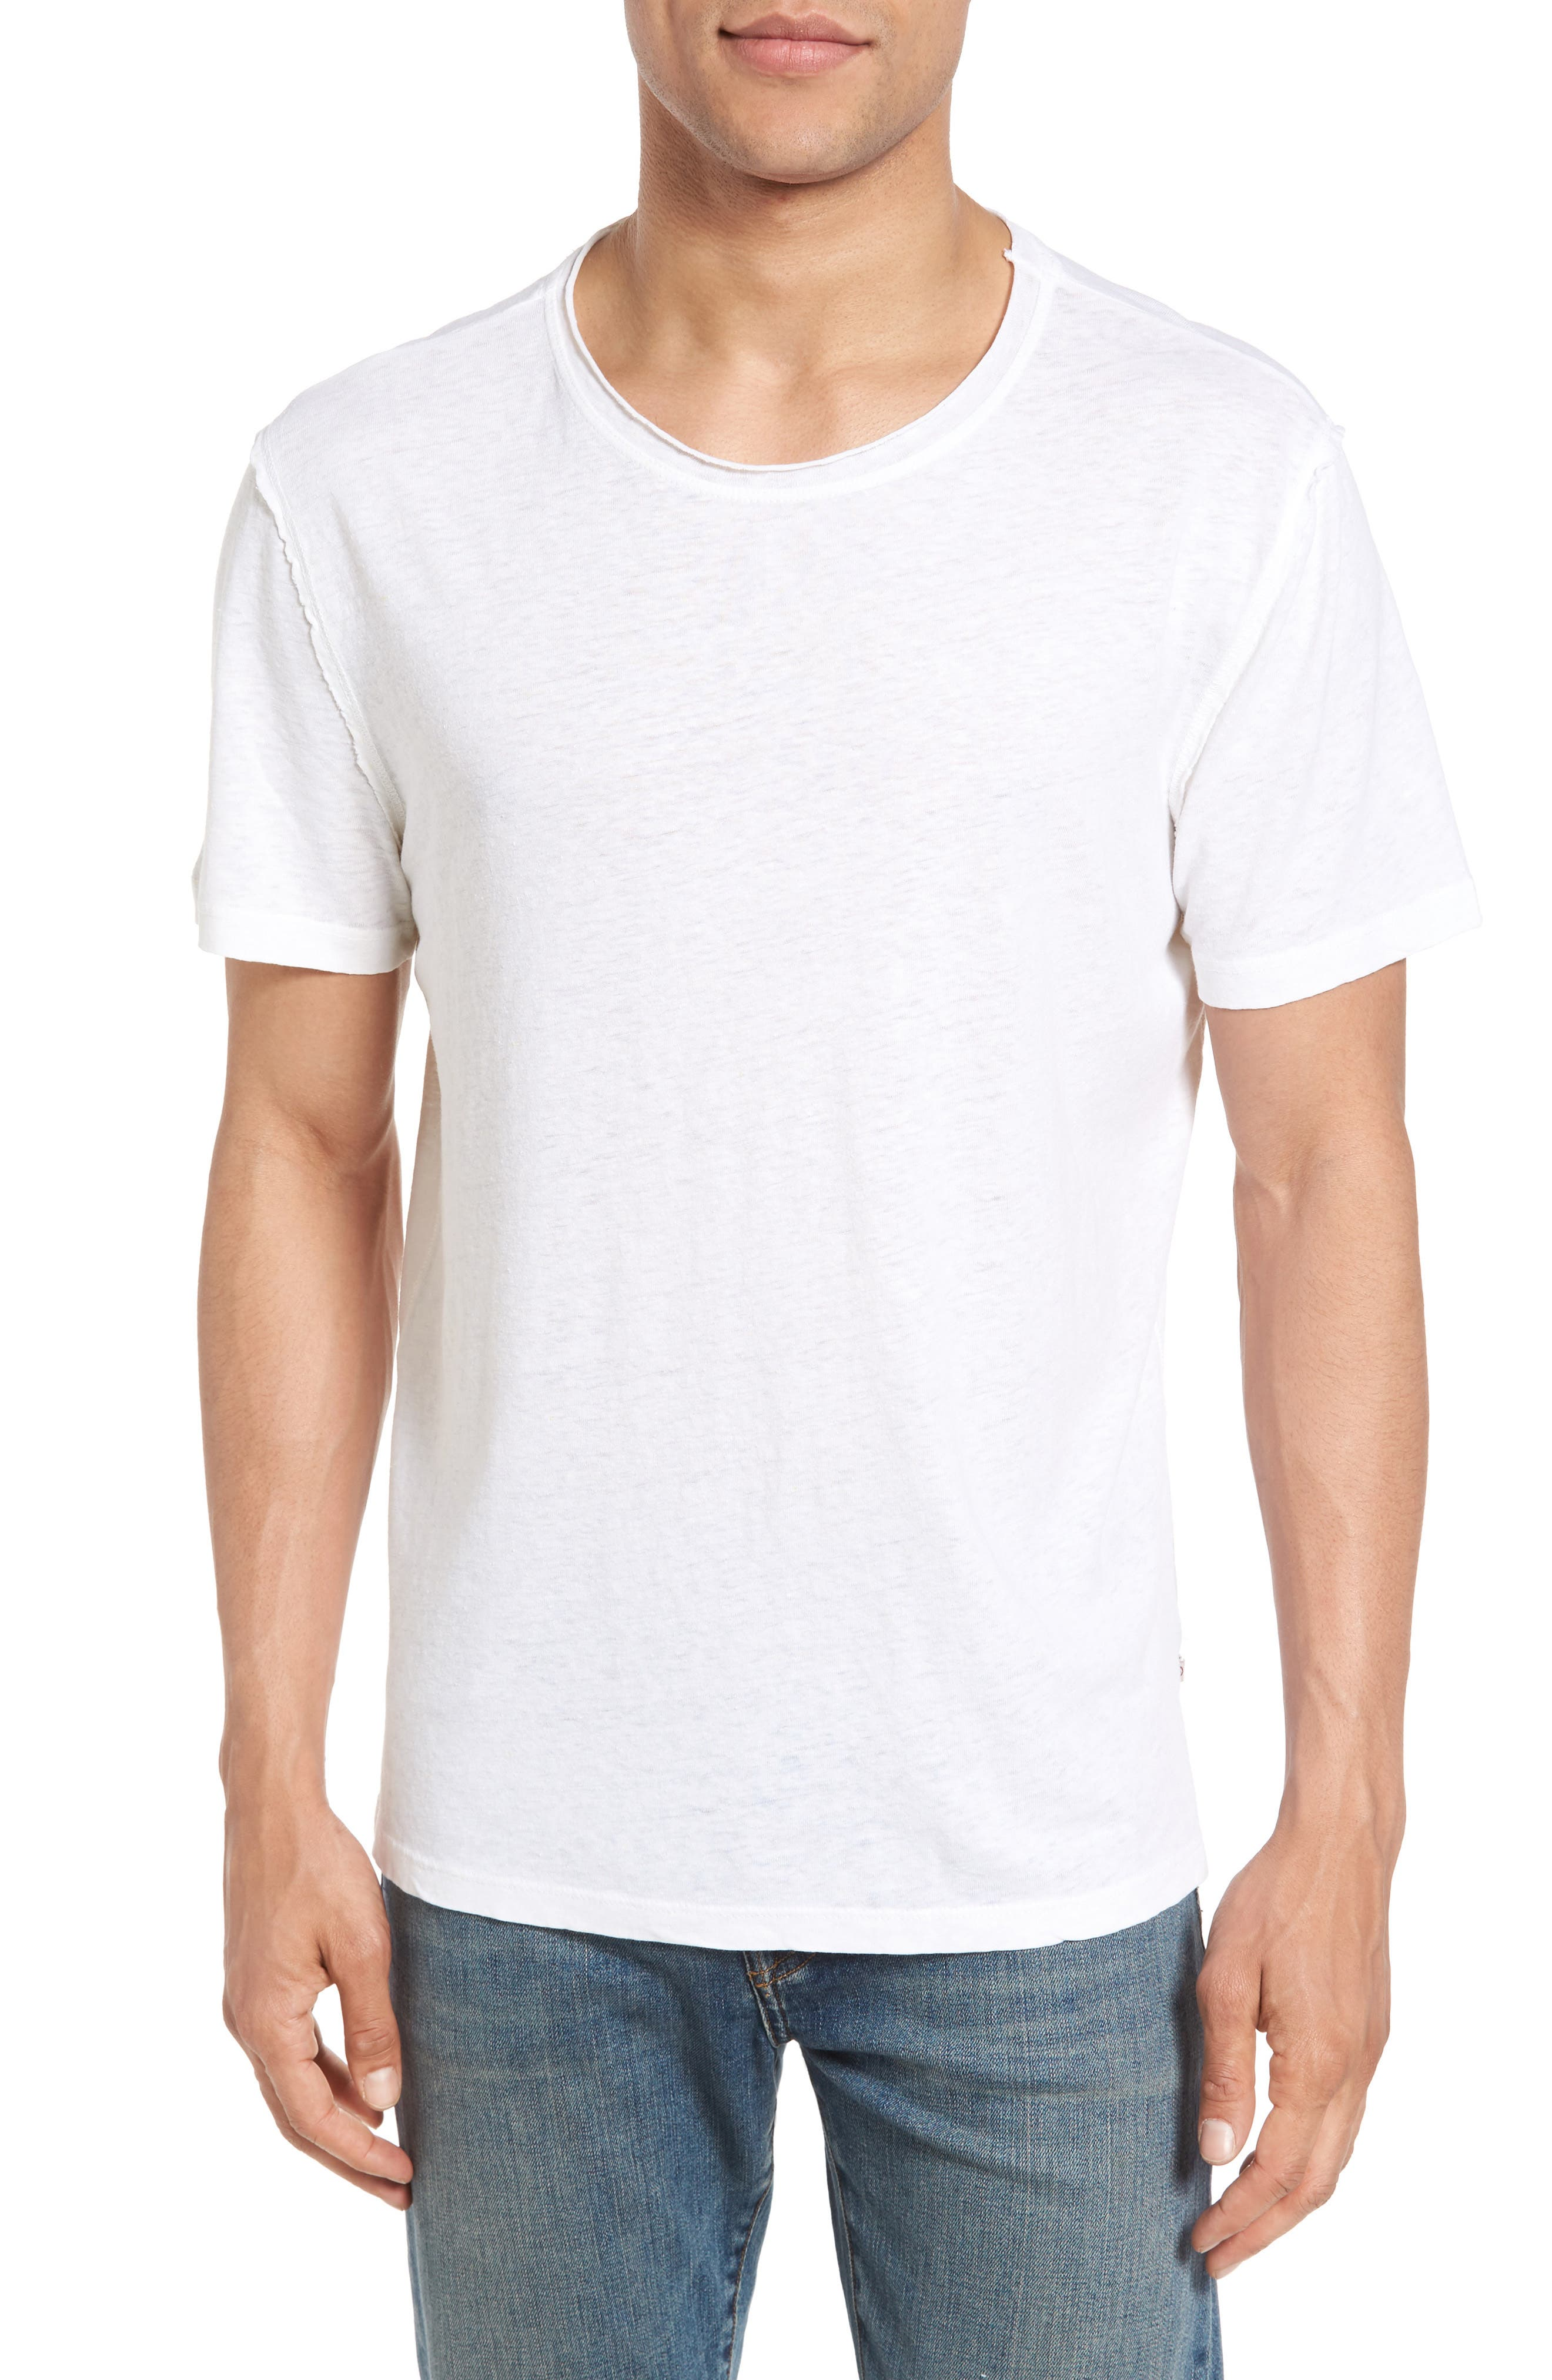 AG Theo Slim Fit Hemp & Organic Cotton Crewneck T-Shirt